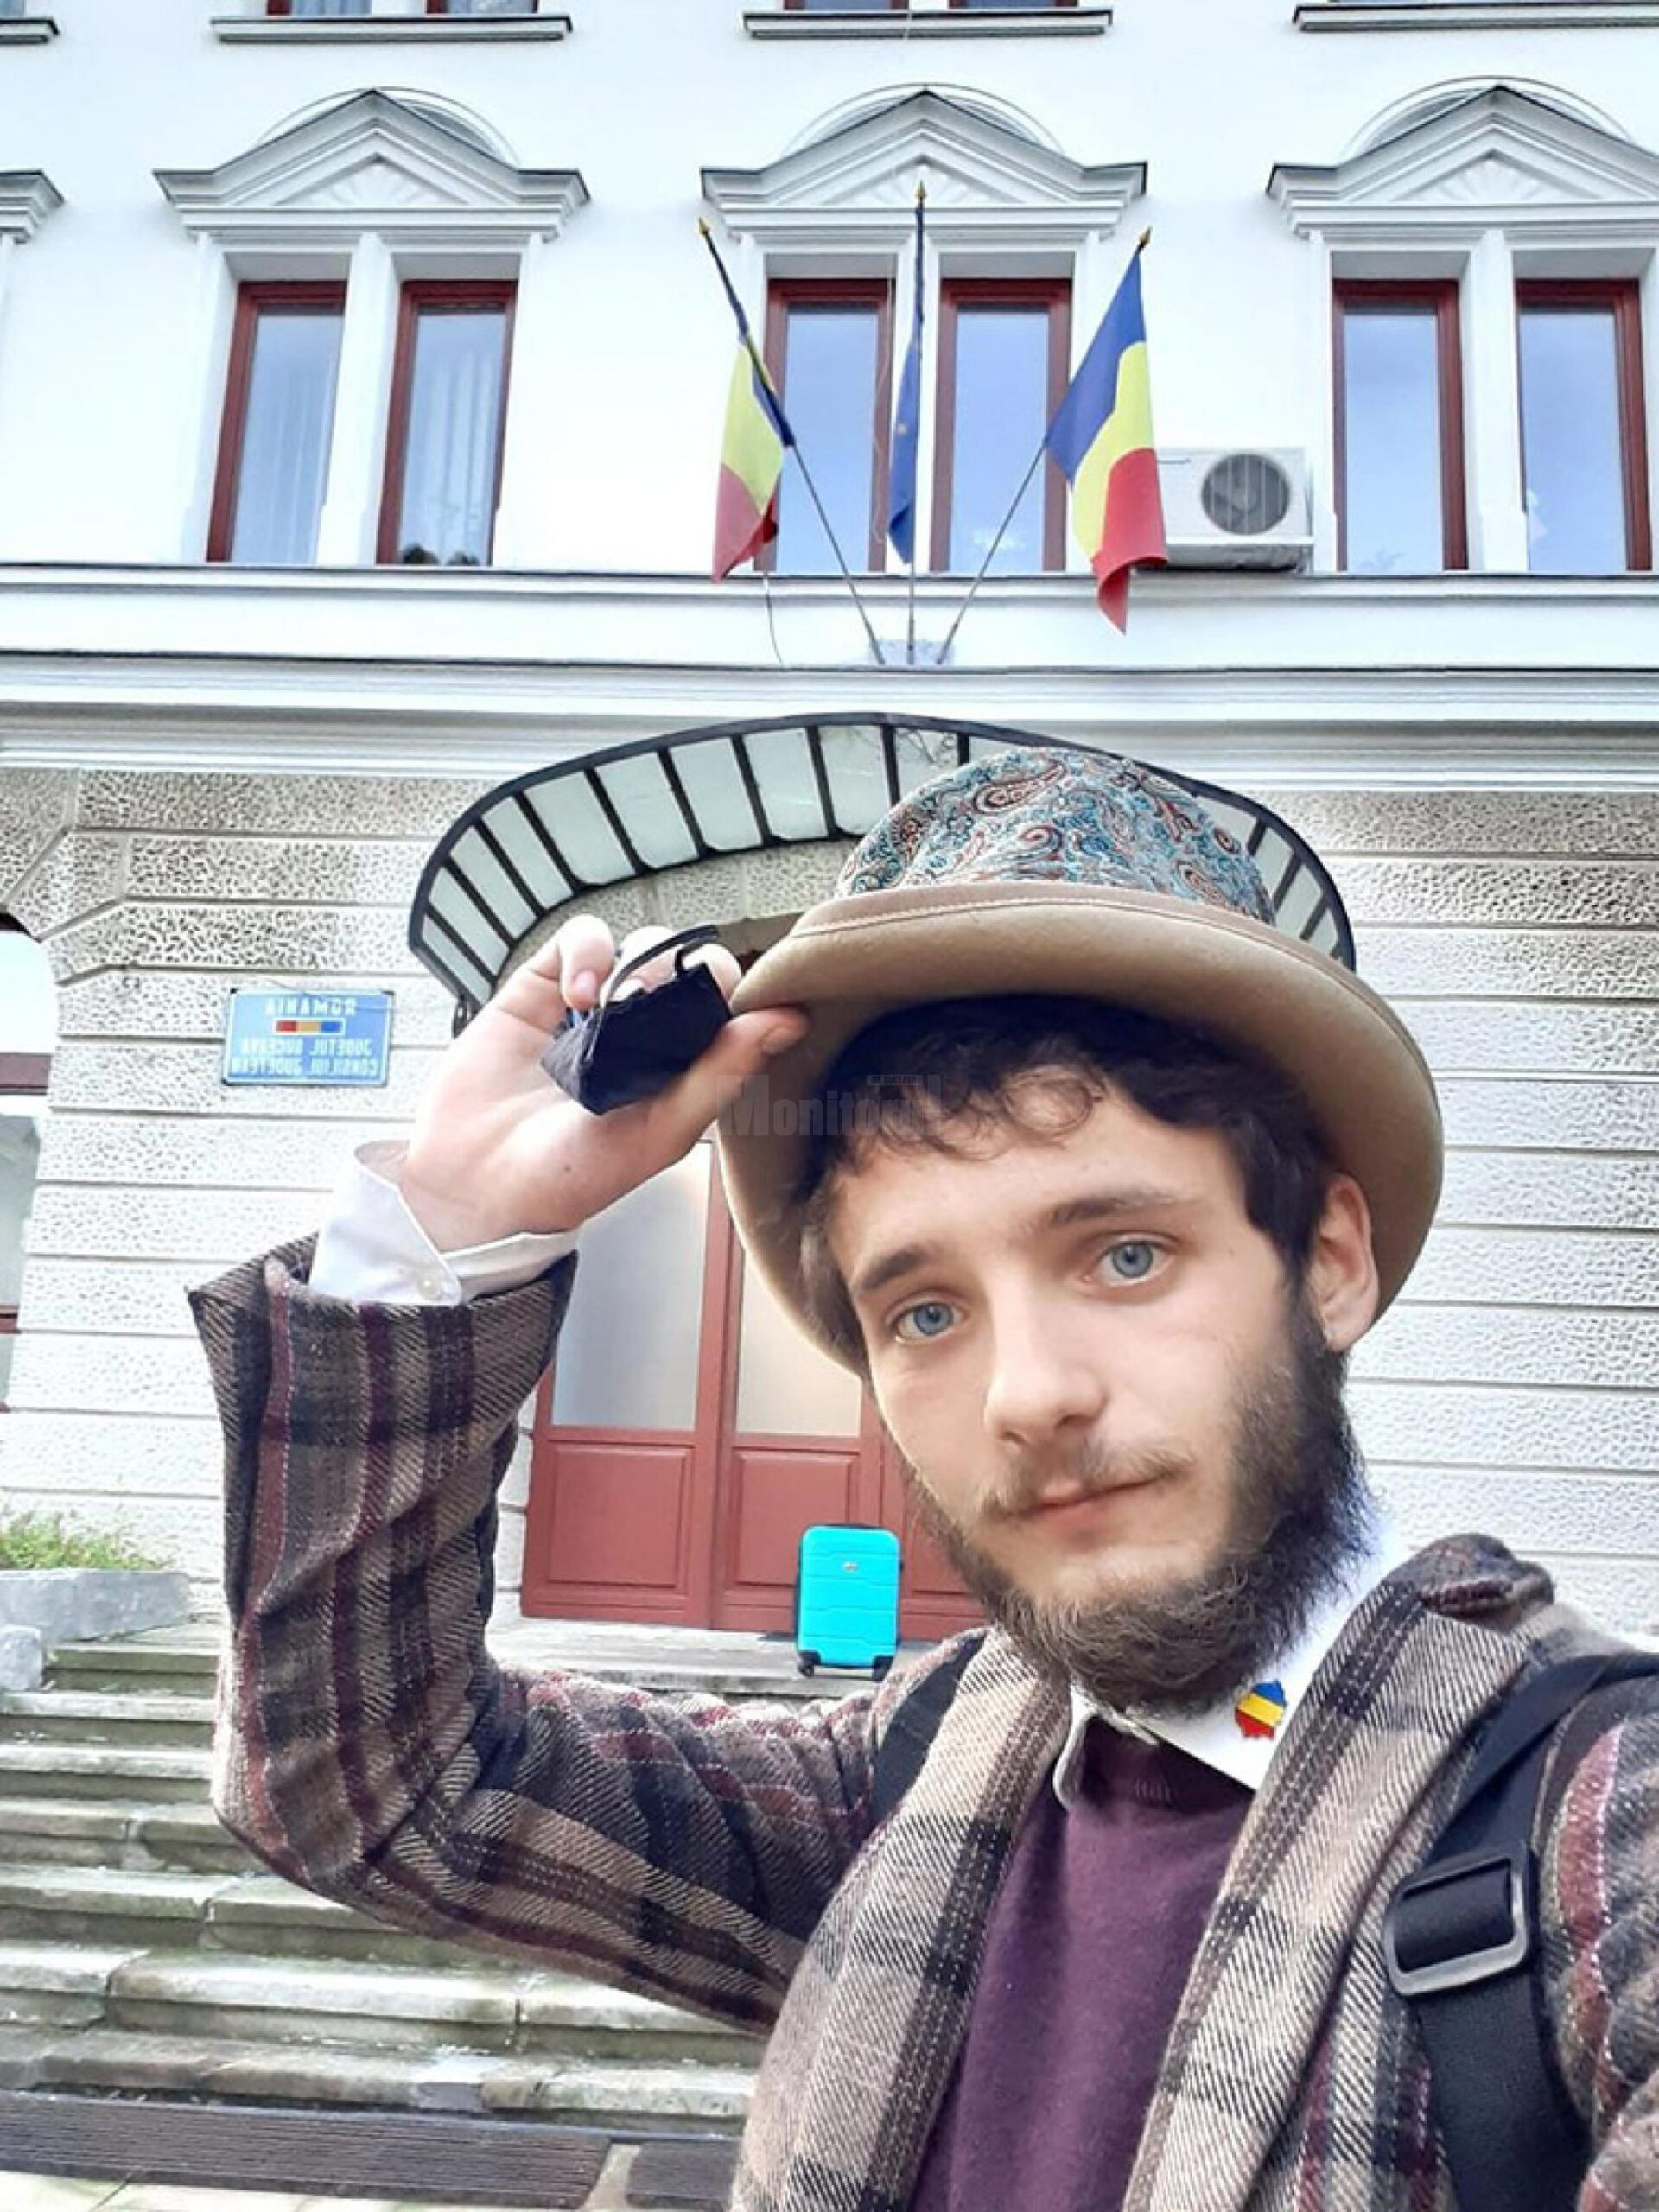 Faceti cunostinta cu un candidat Independent de partide dependent de Bucovina